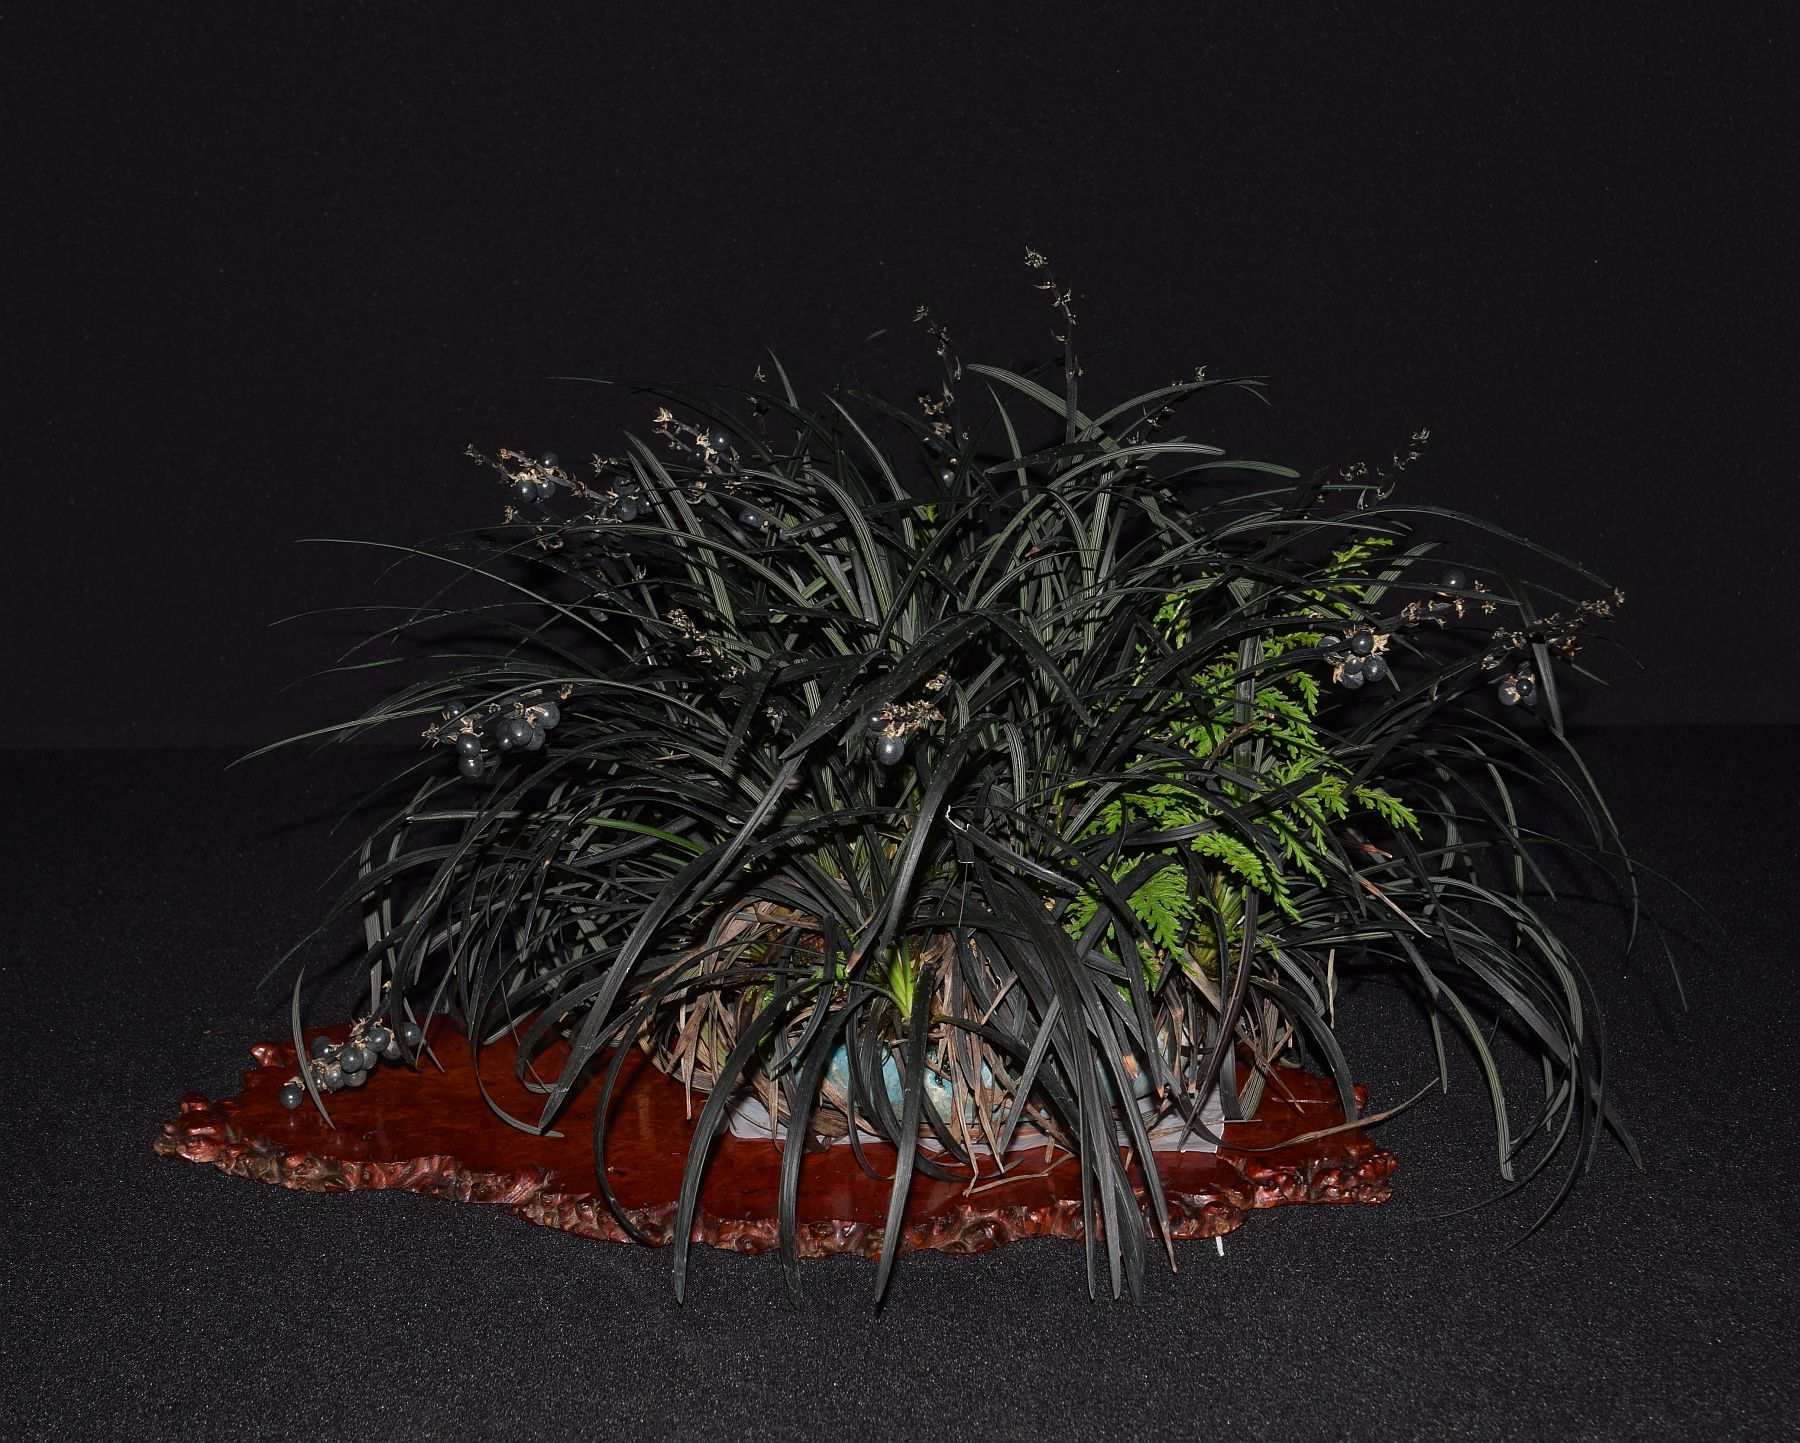 bonsai-museum-luis-vallejo-008